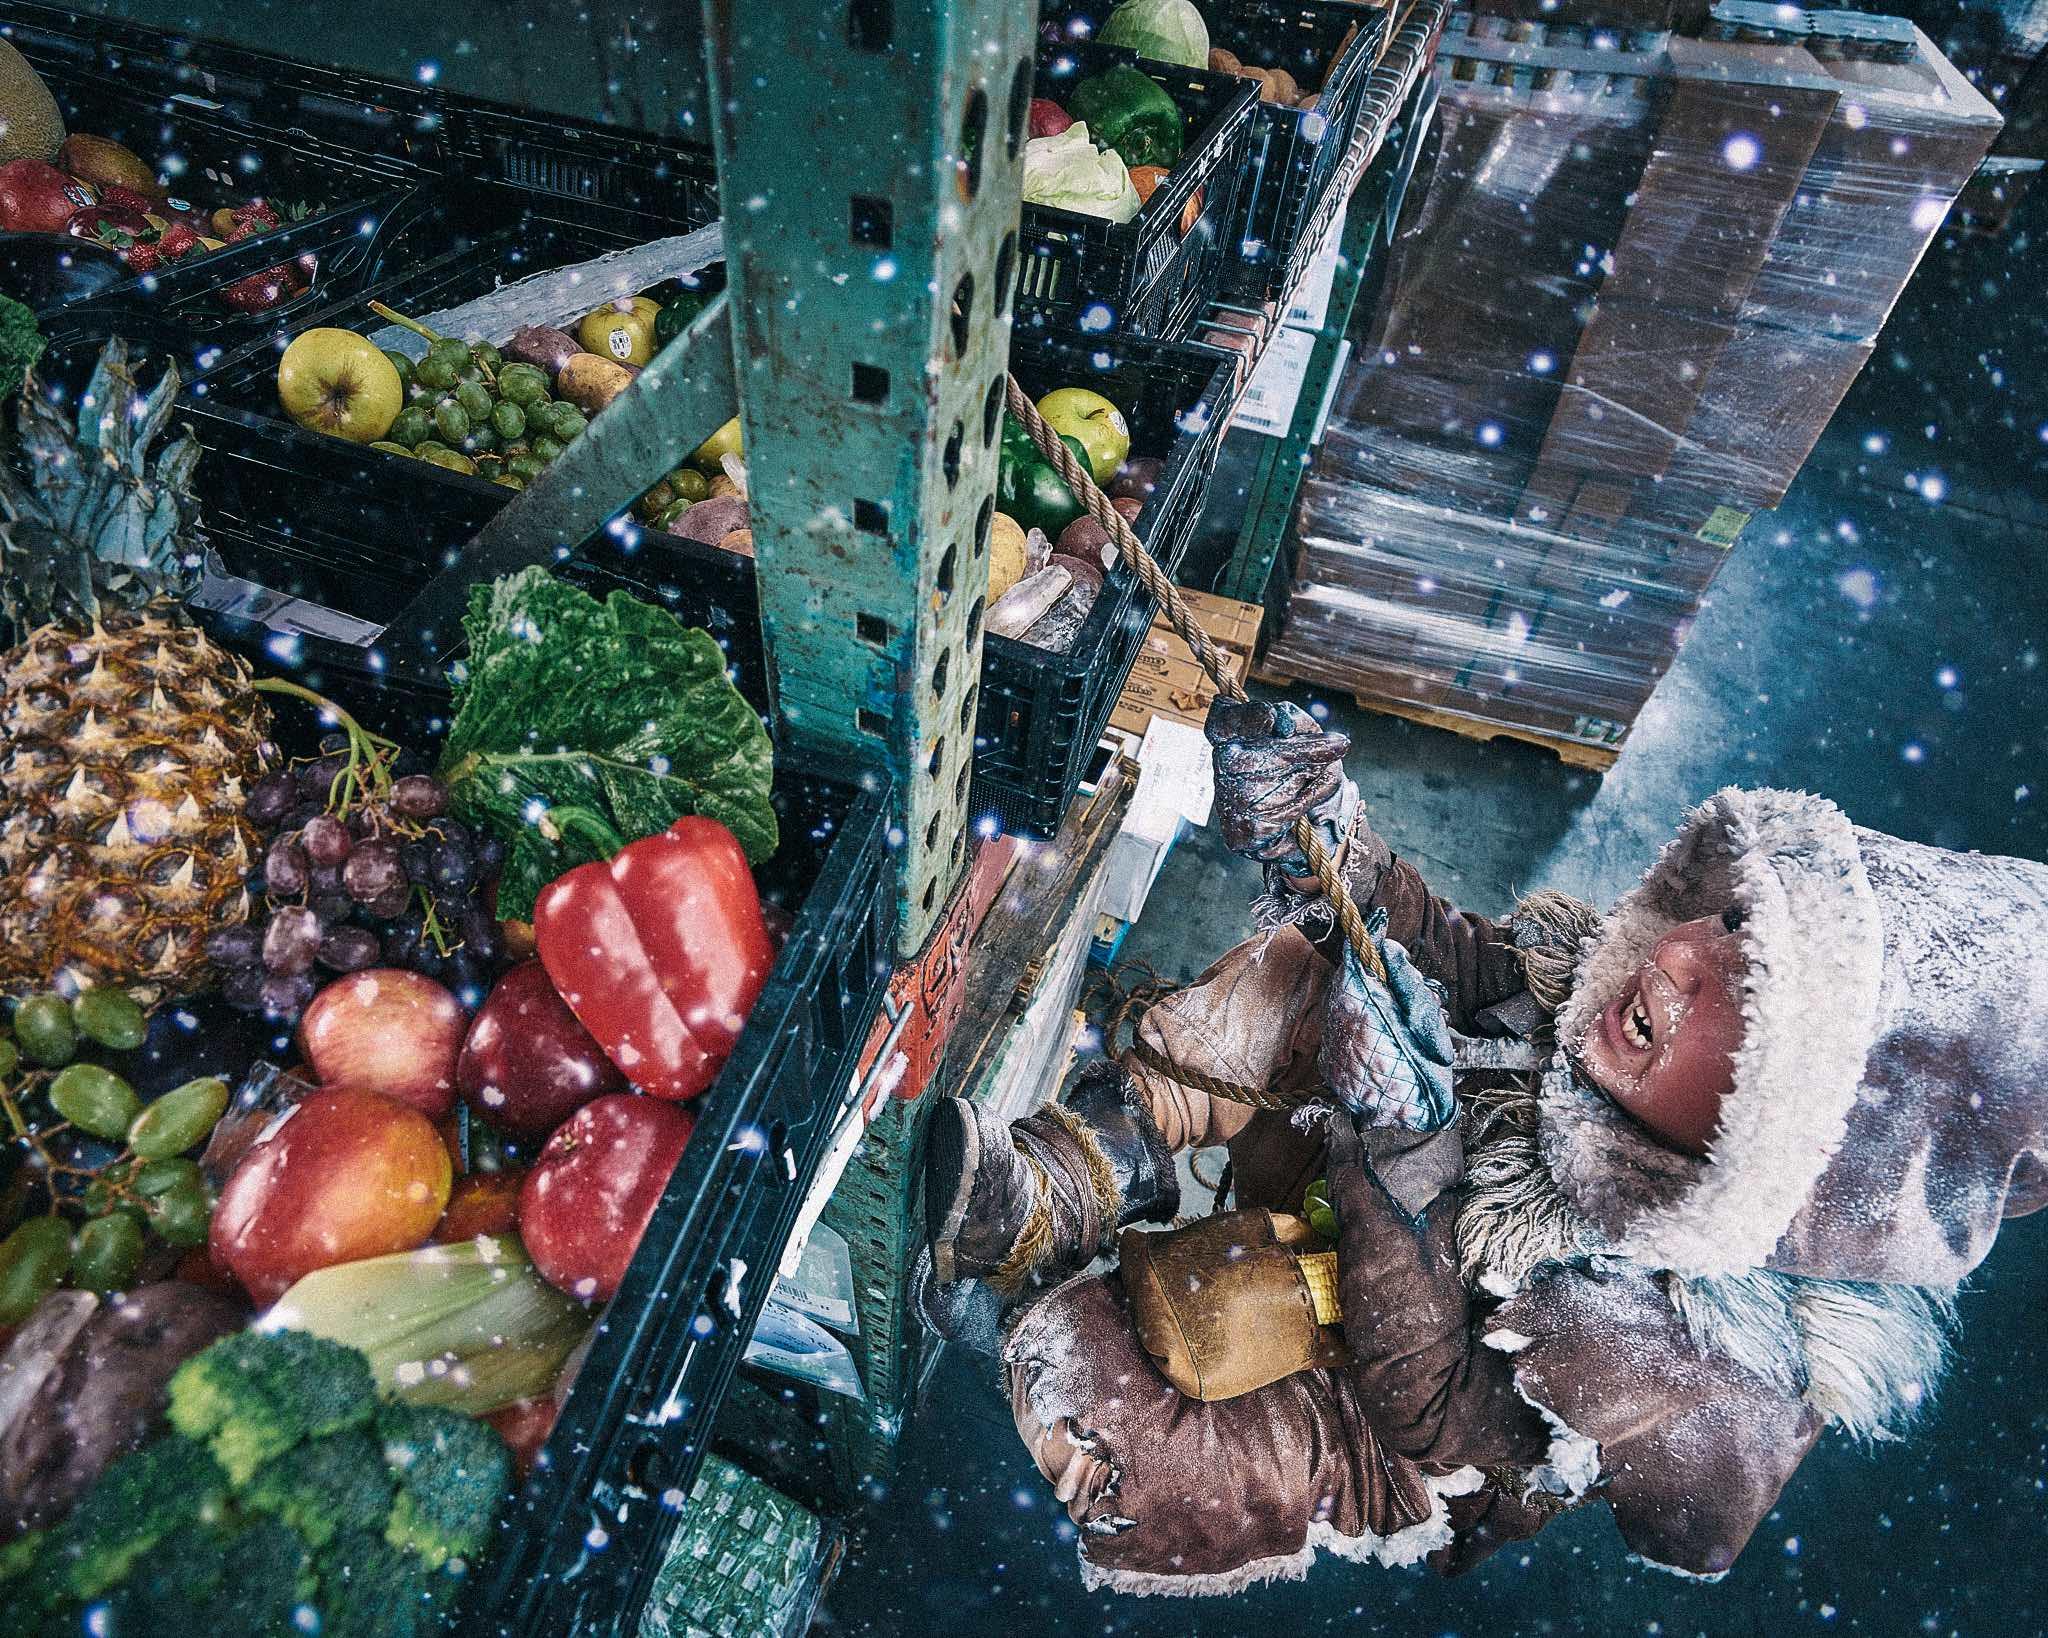 Second Harvest Foodbank Social Media Campaign